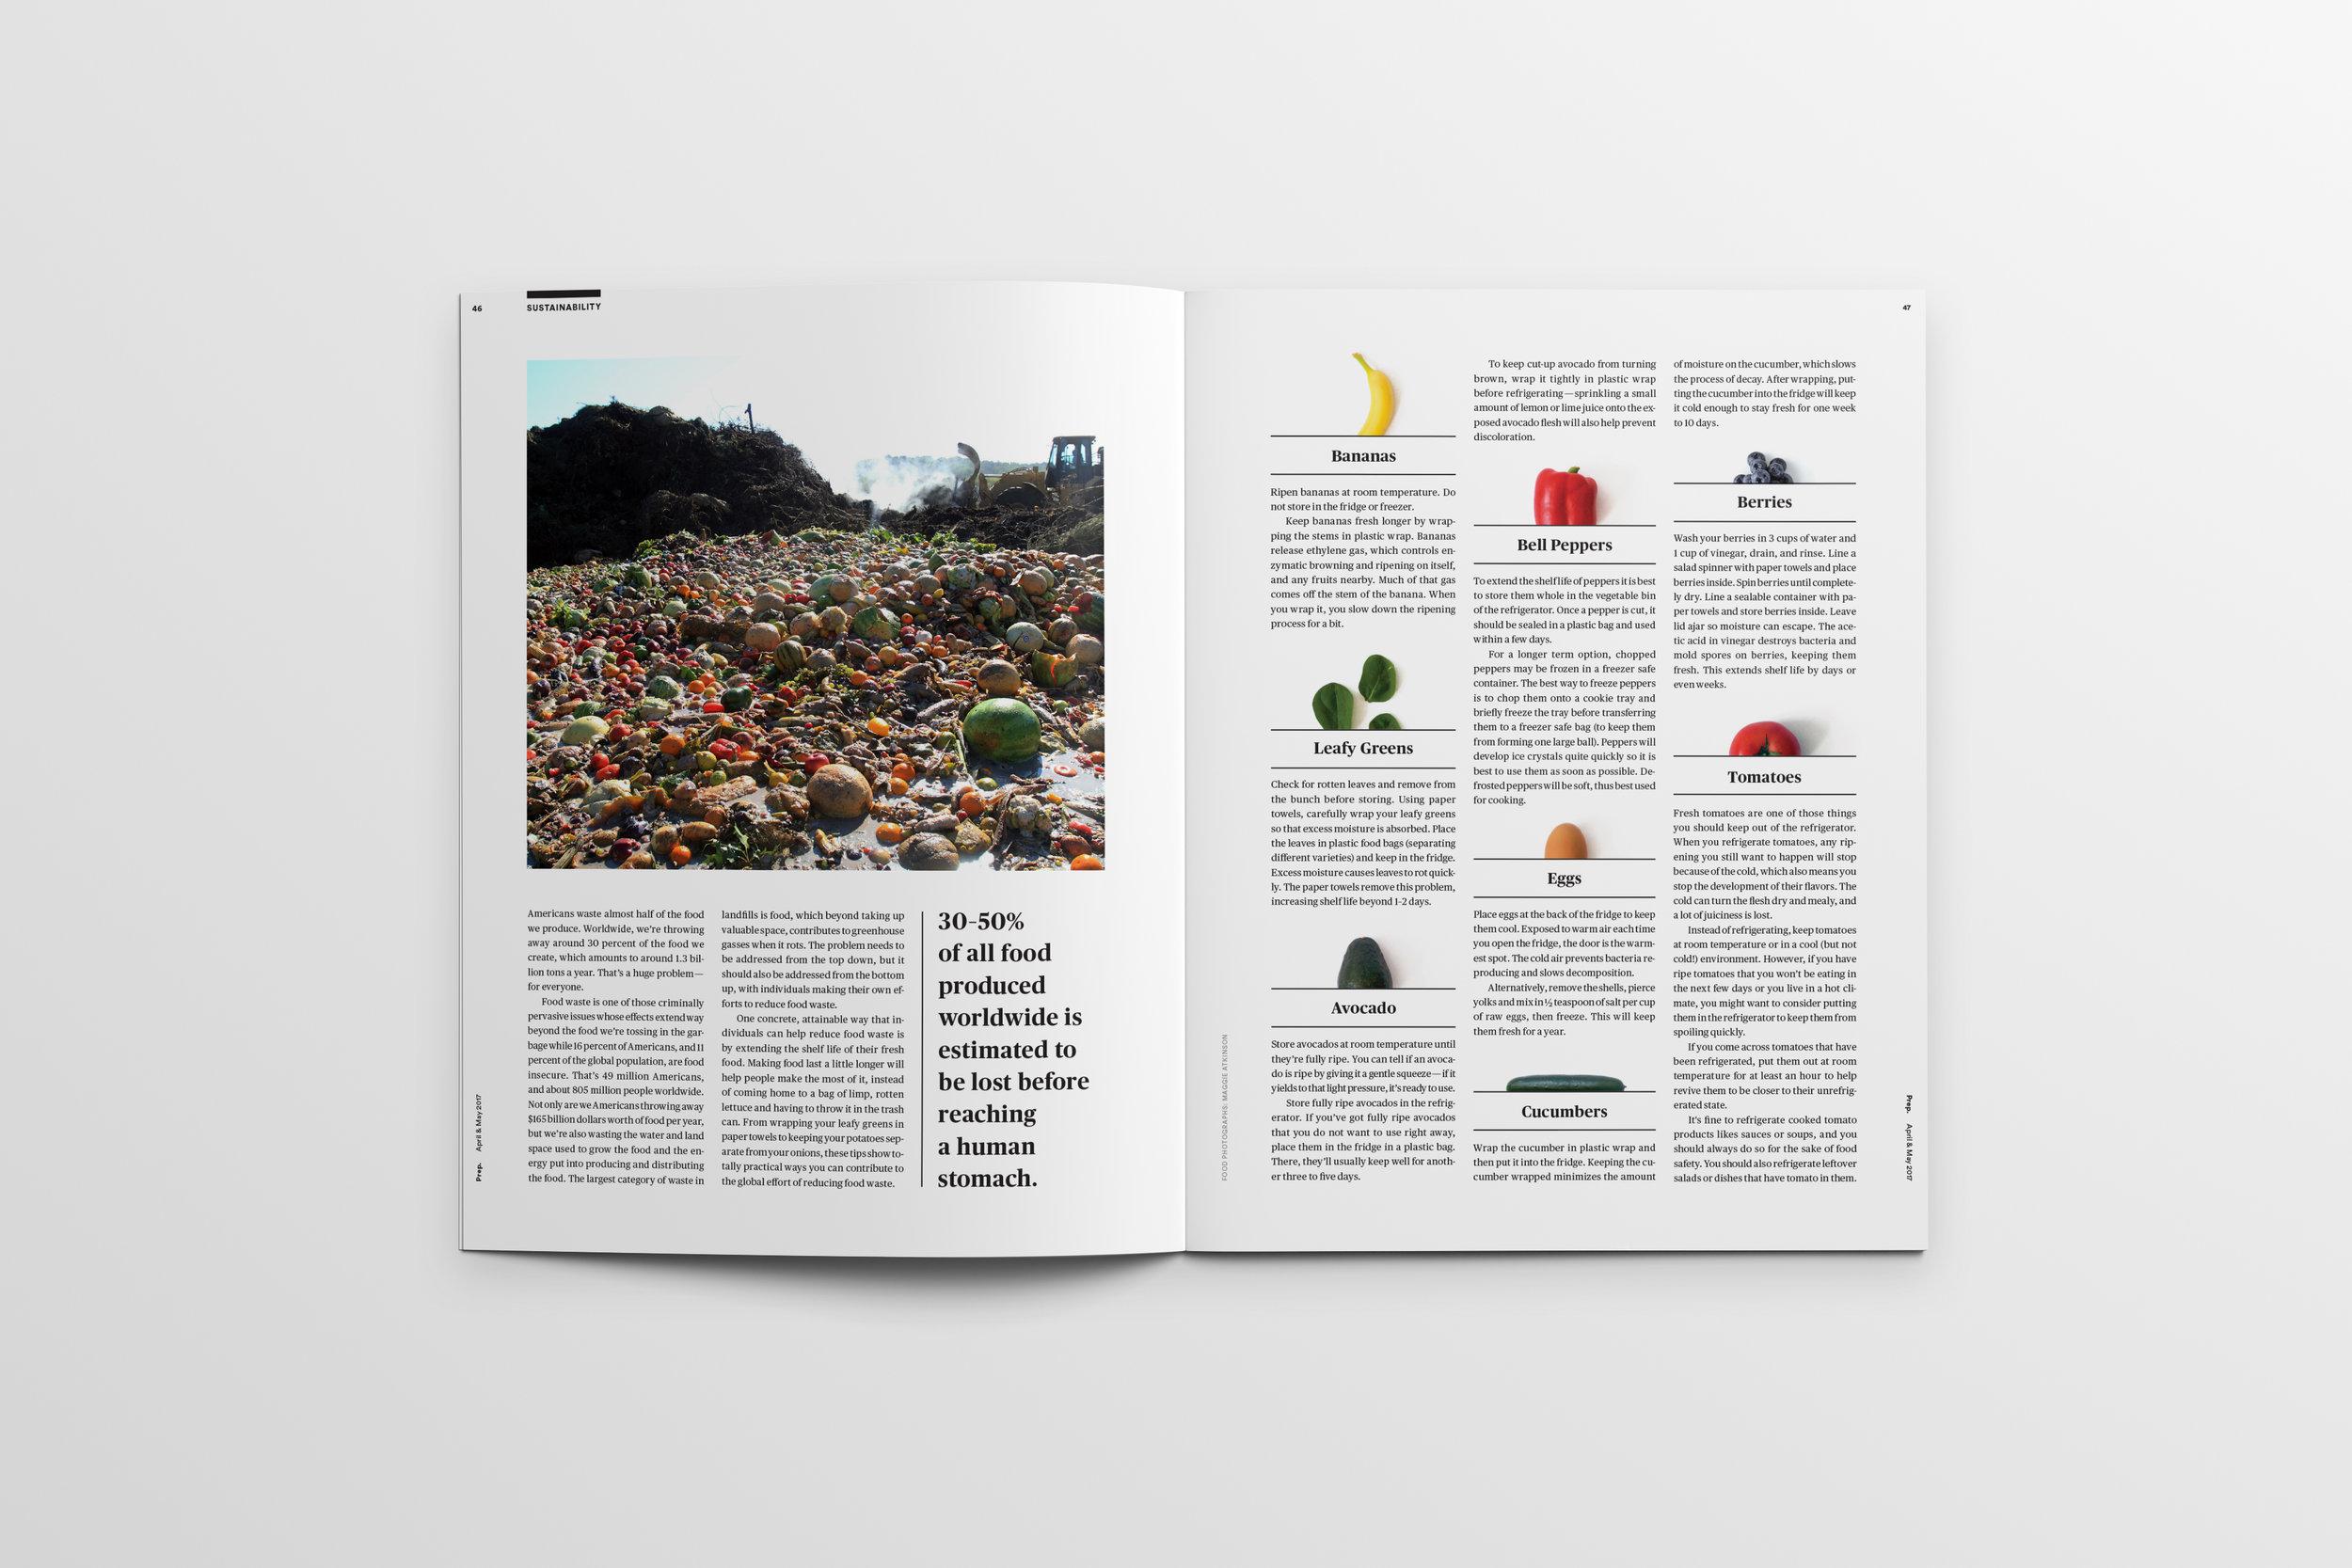 Magazine_Mockup_Pages45-46.jpg